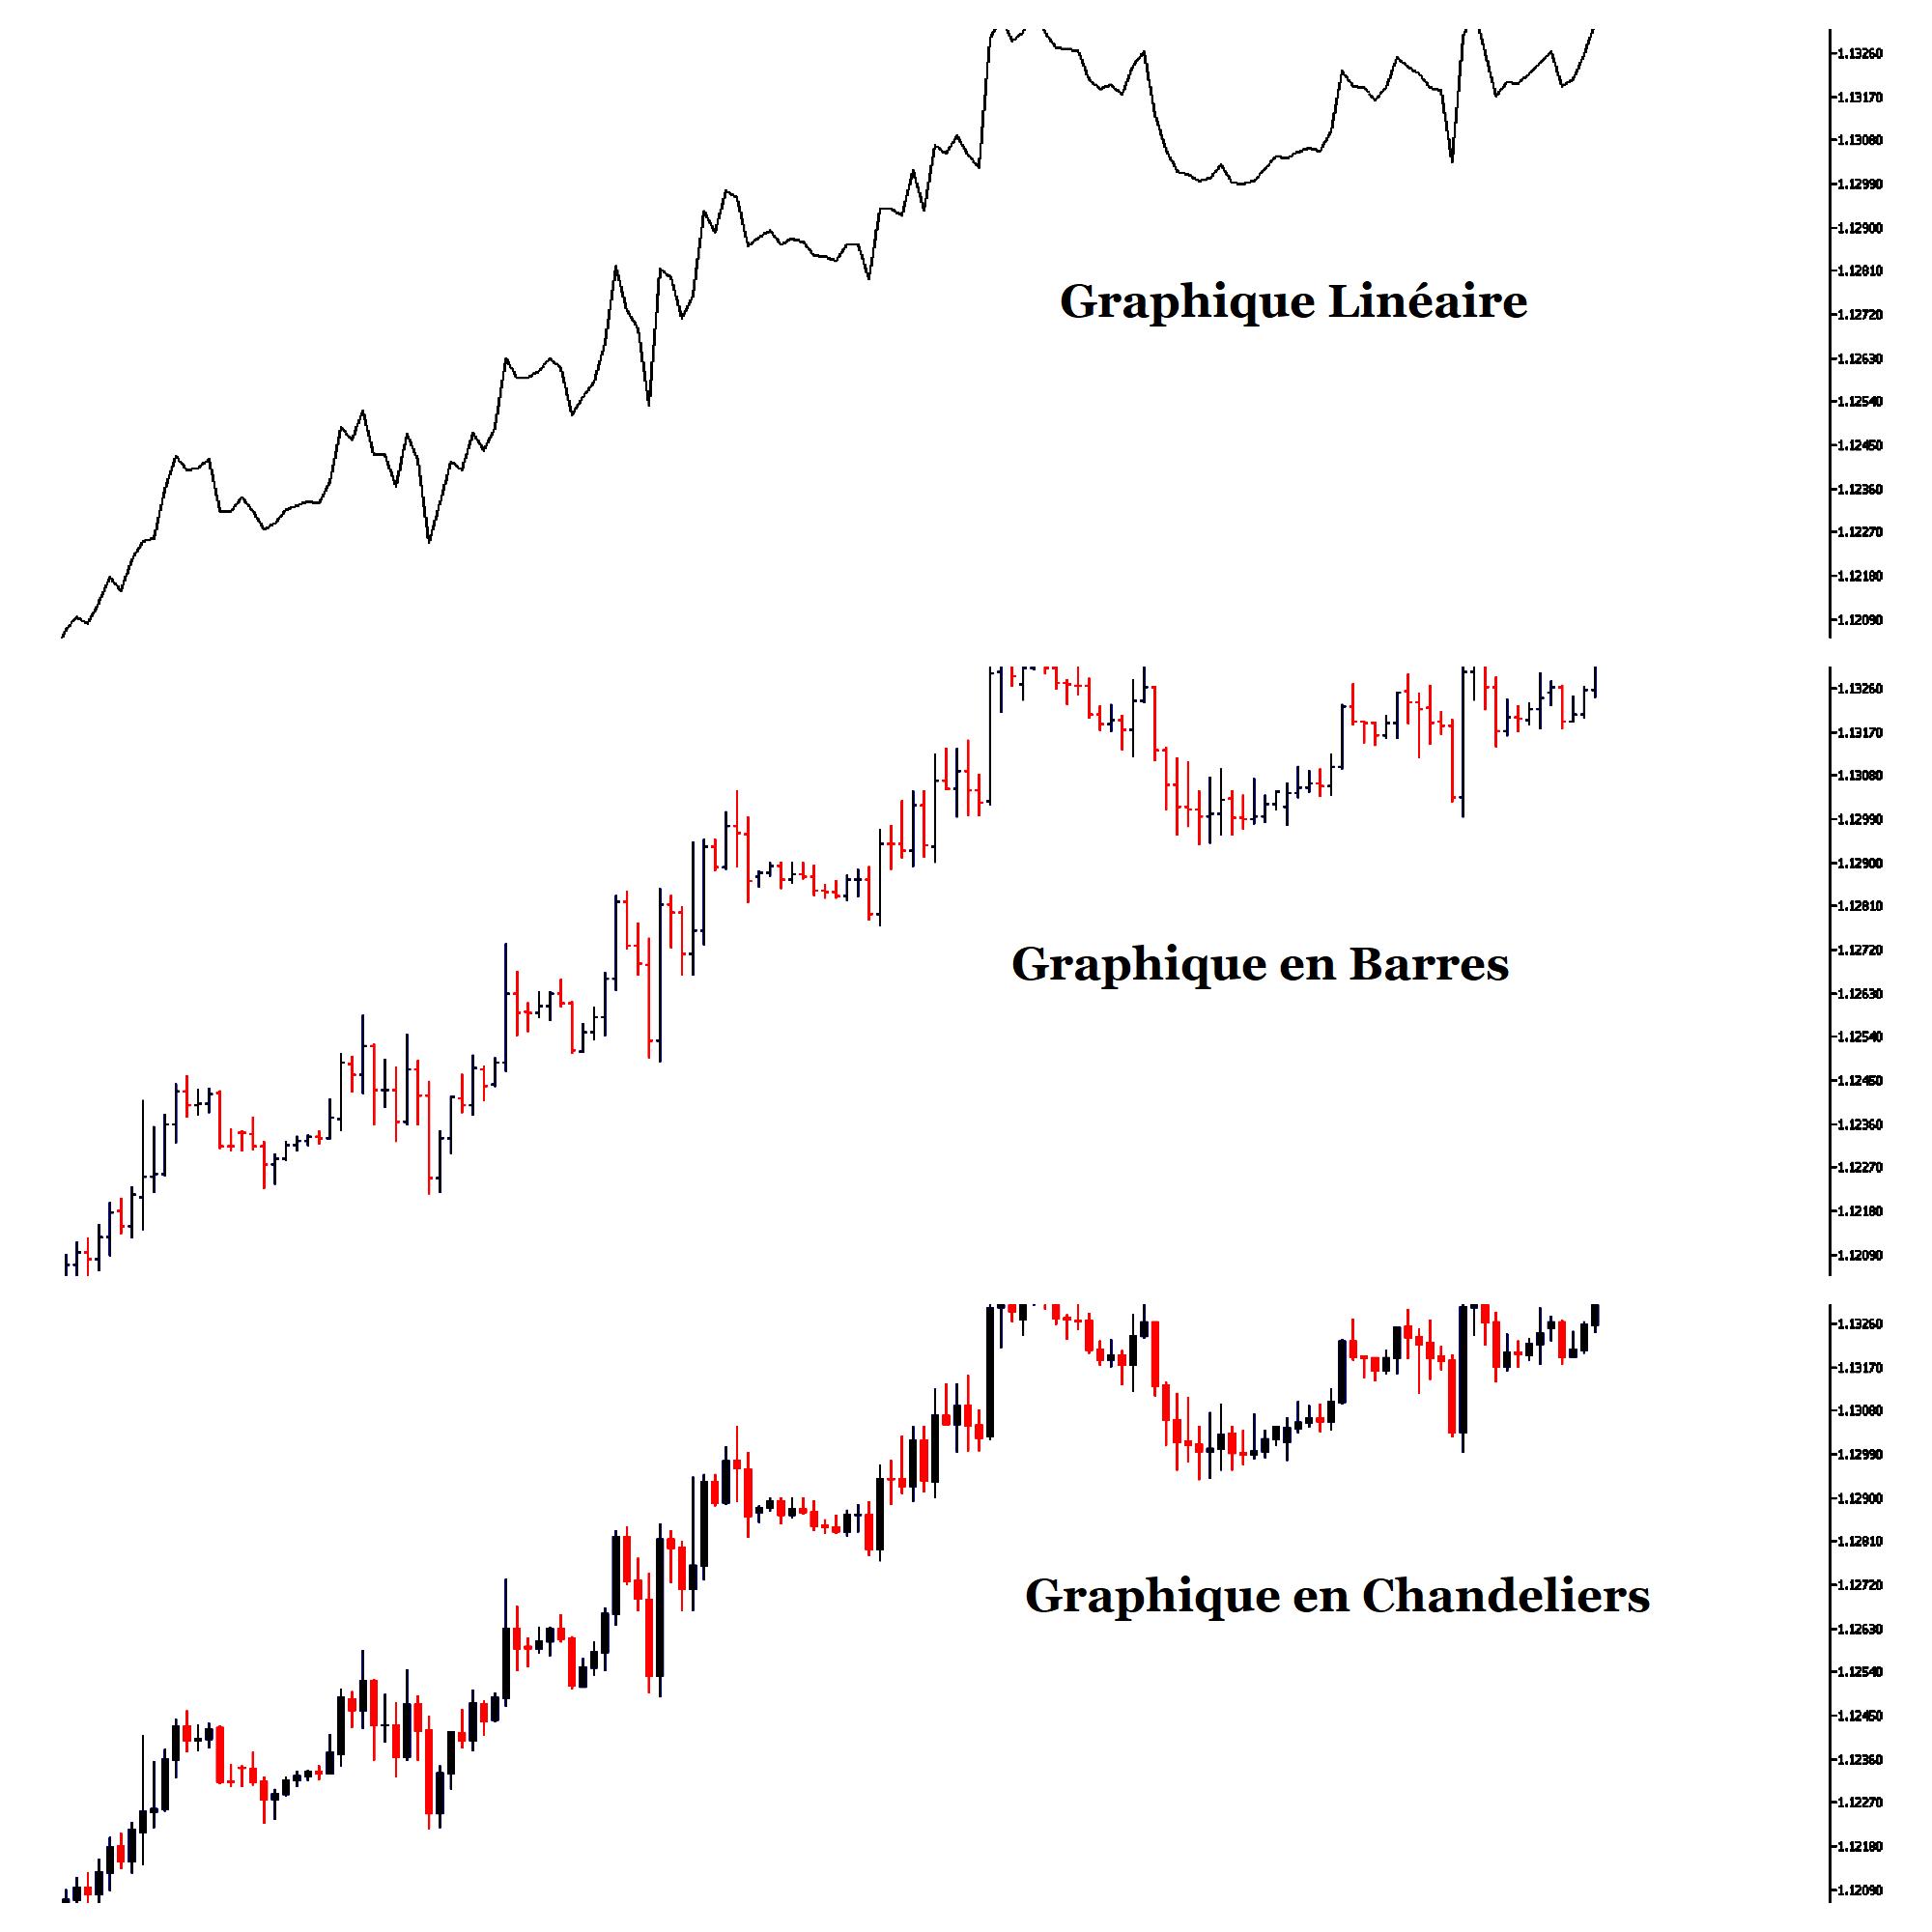 grafic tehnic pentru tranzactionare